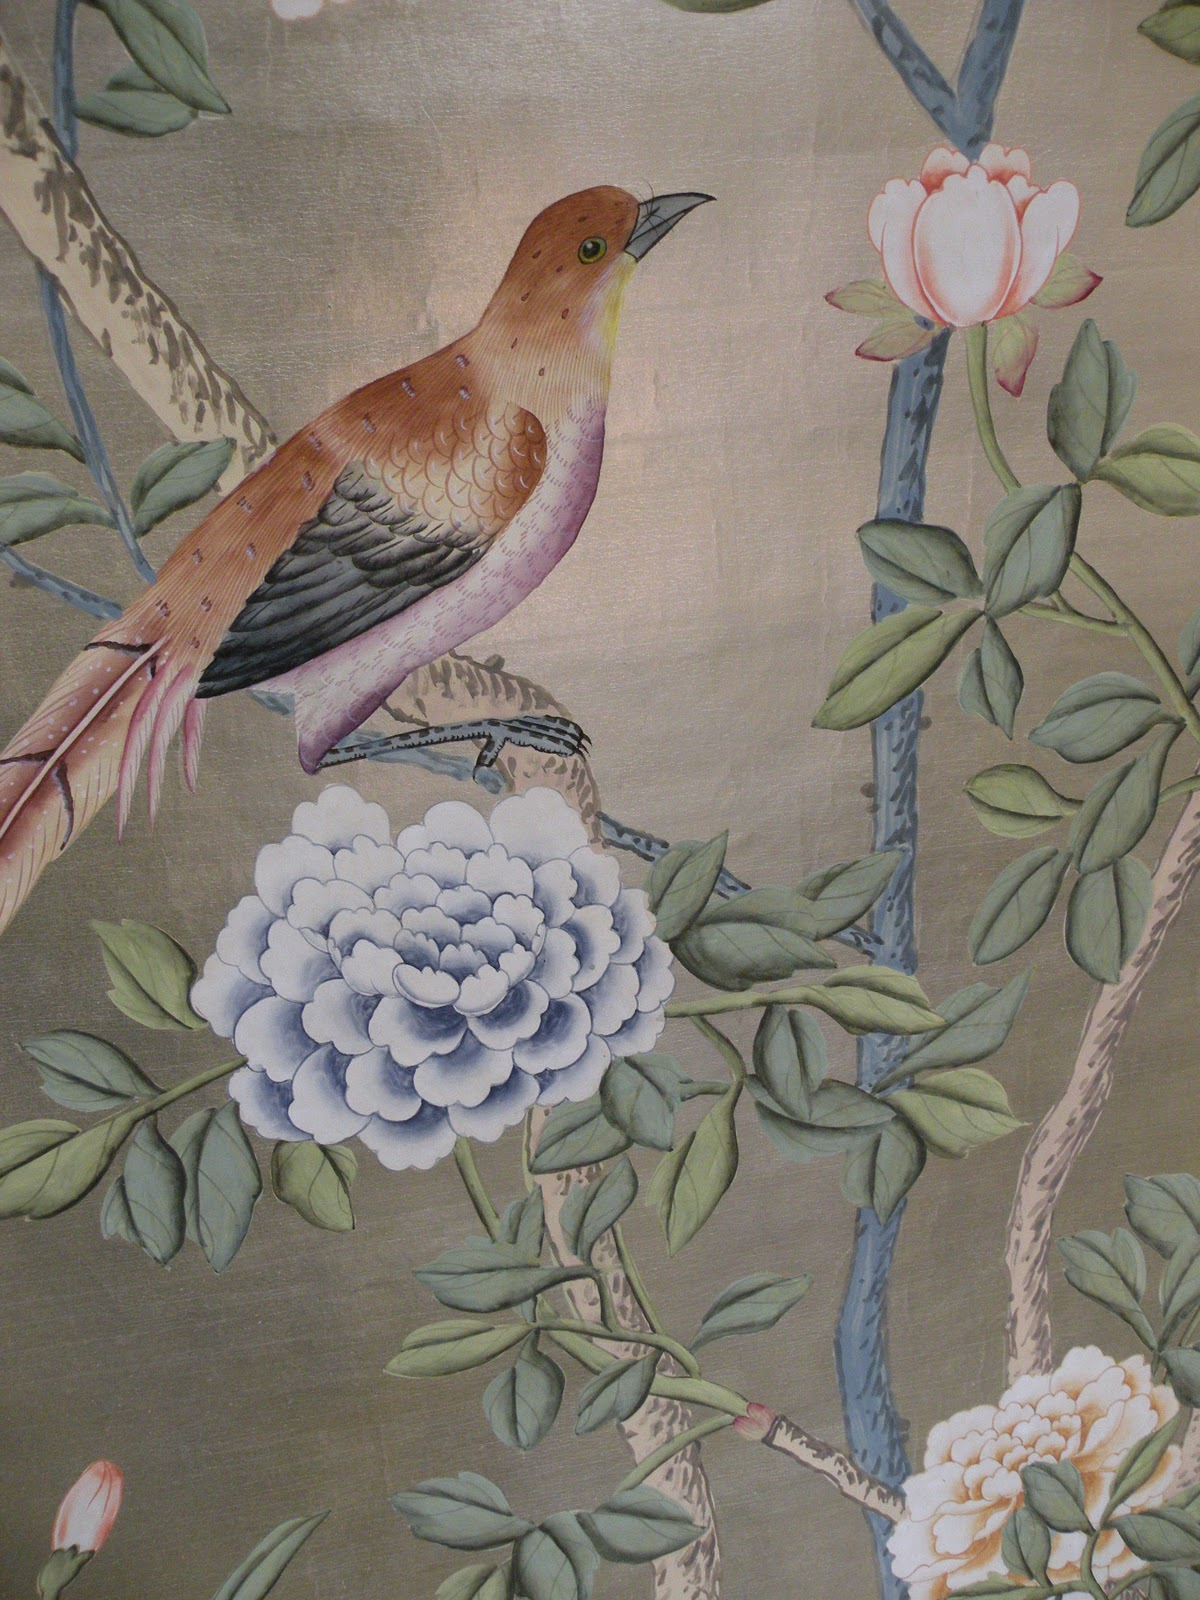 Chloe van paris de gournay hand painted wallpaper for Papel pintado romantico